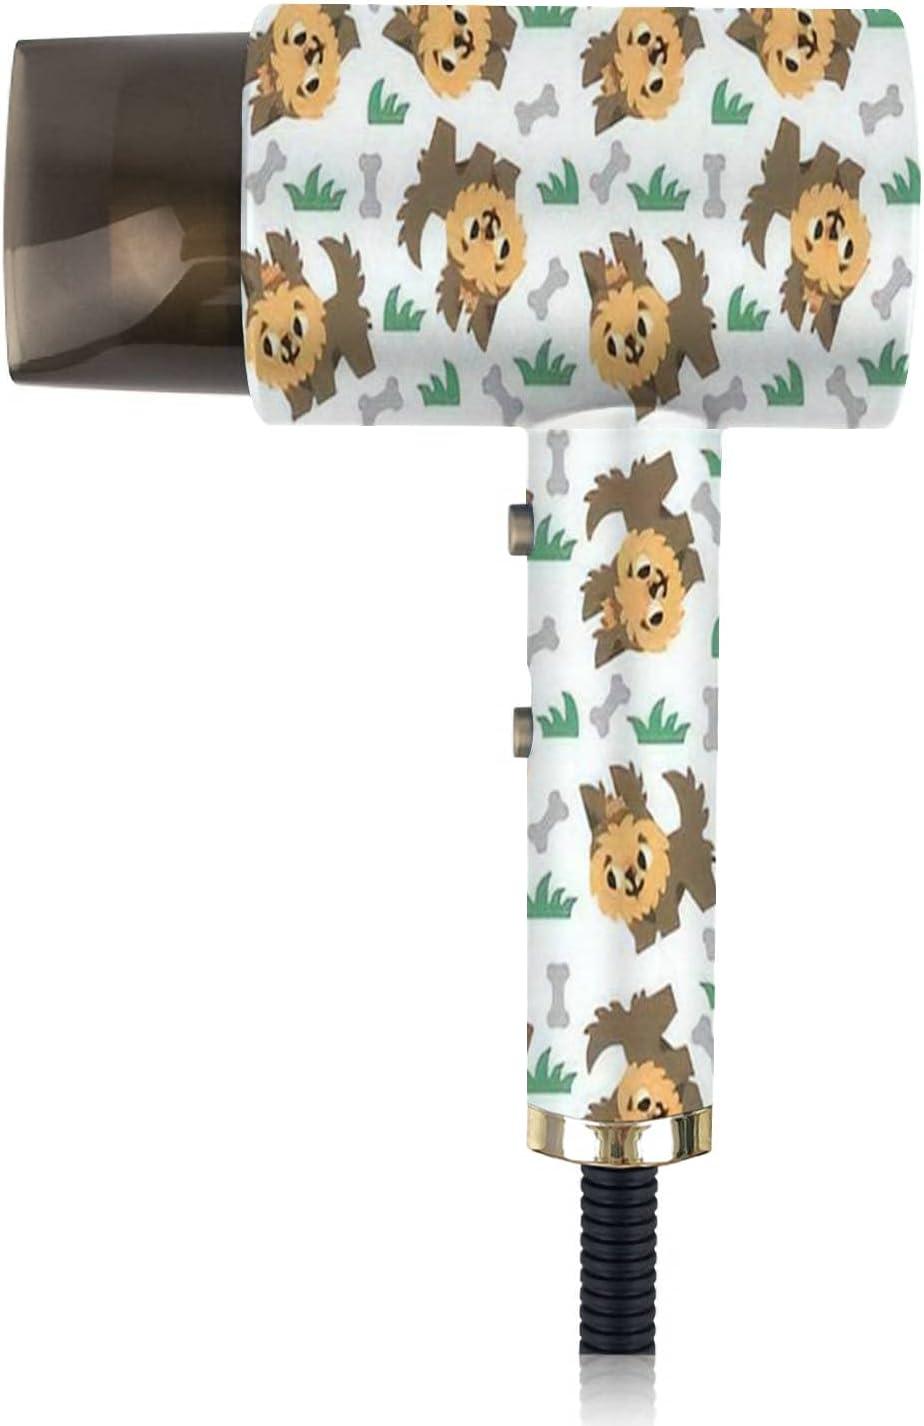 Spasm price Ionic Hair Dryer Yorkshire Terrier Portable Pattern List price Dog Seamless